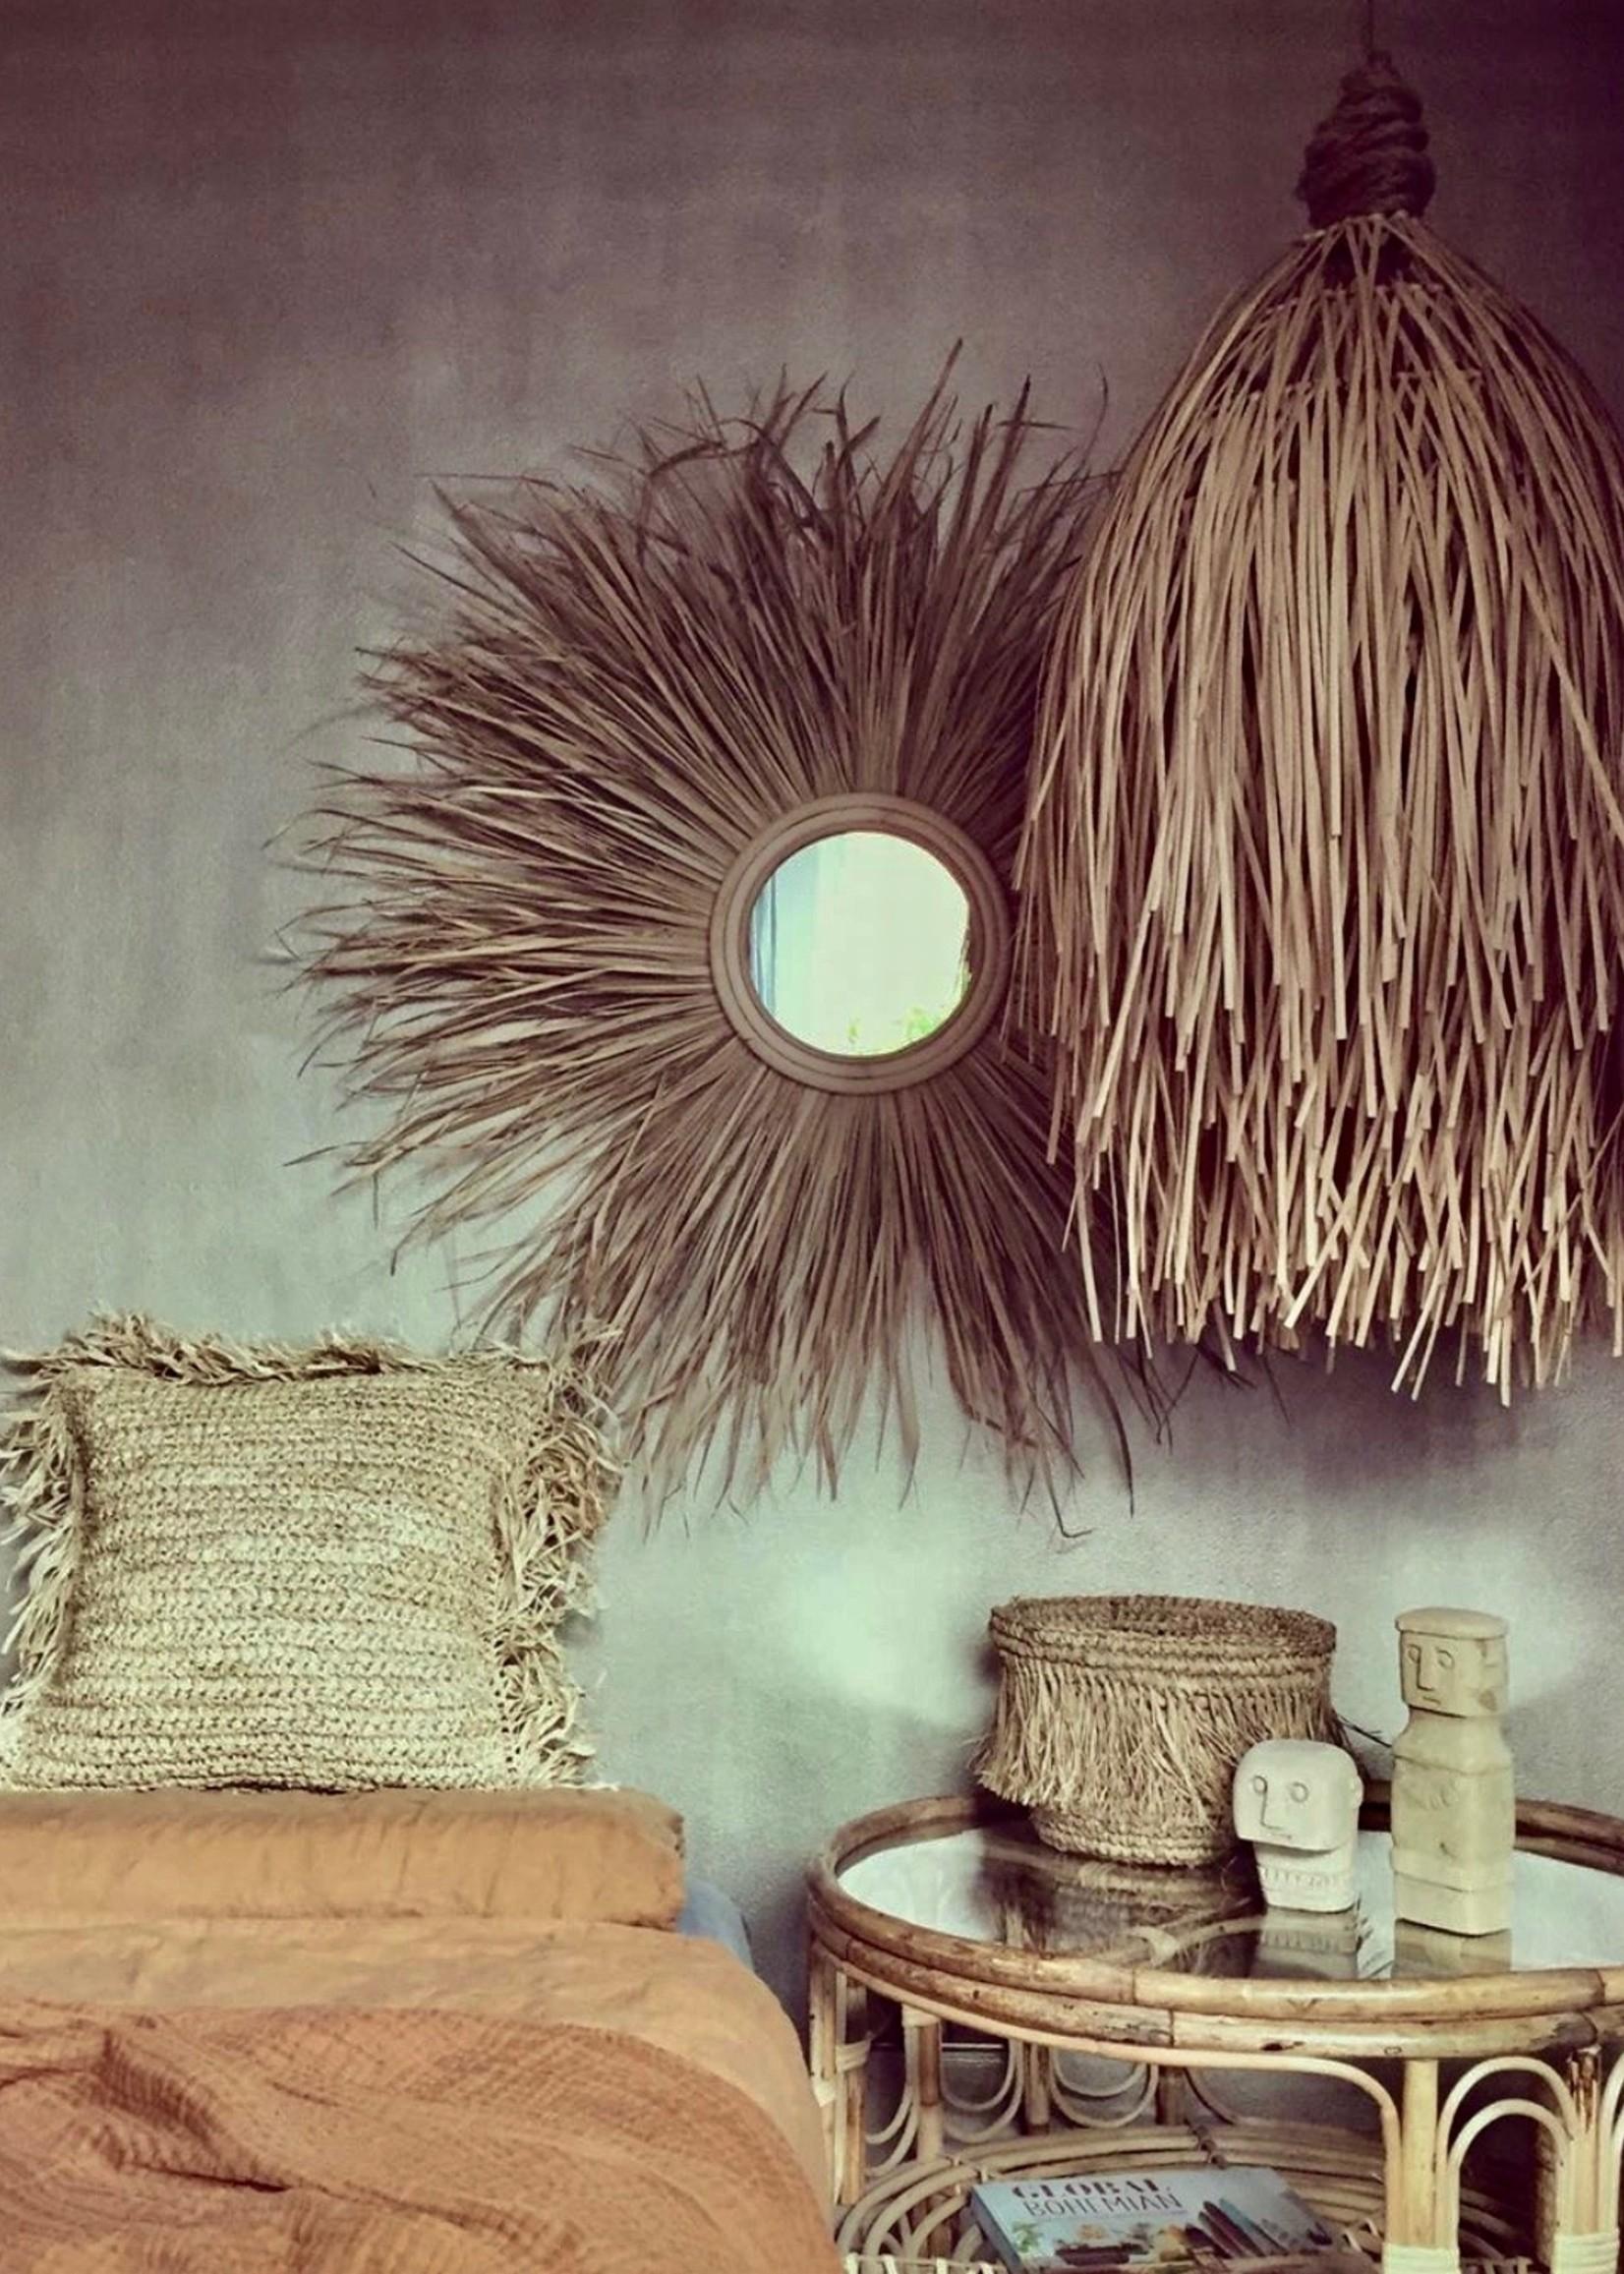 The Grass Mirror - Natural - L